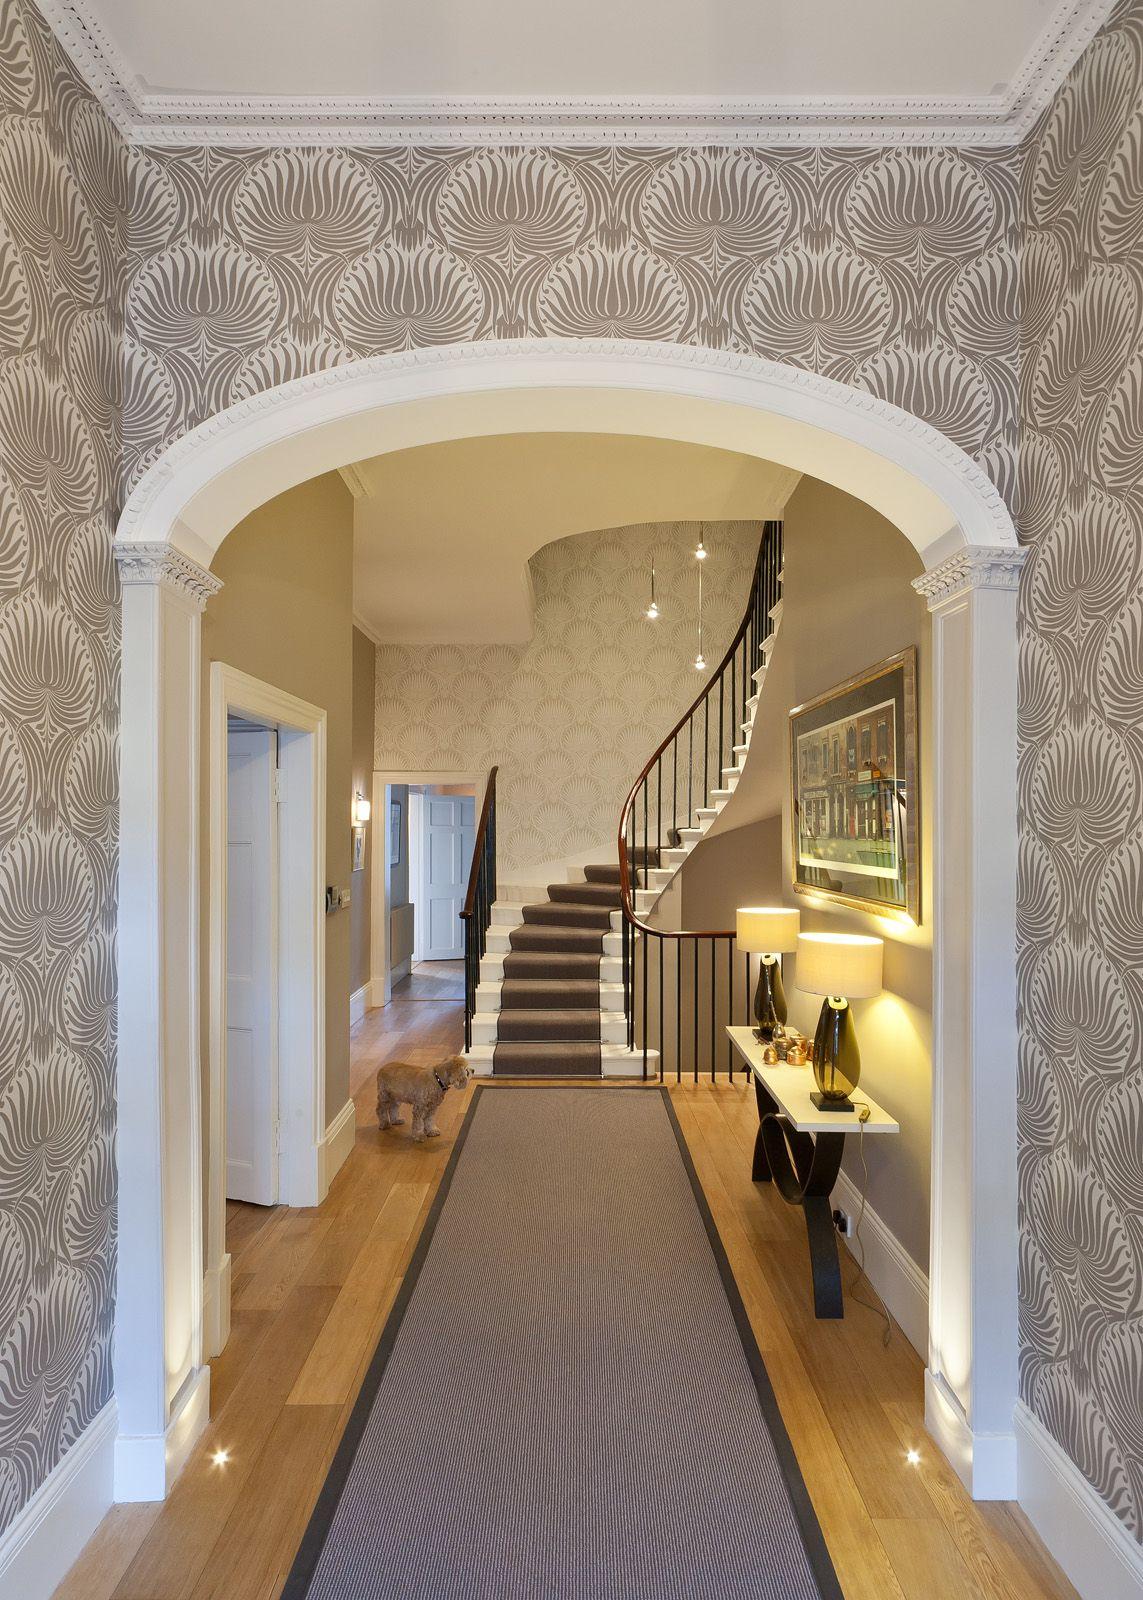 Hallway and stairs wallpaper  Helen Lucas Architects Edinburgh wall paper runner stairwell